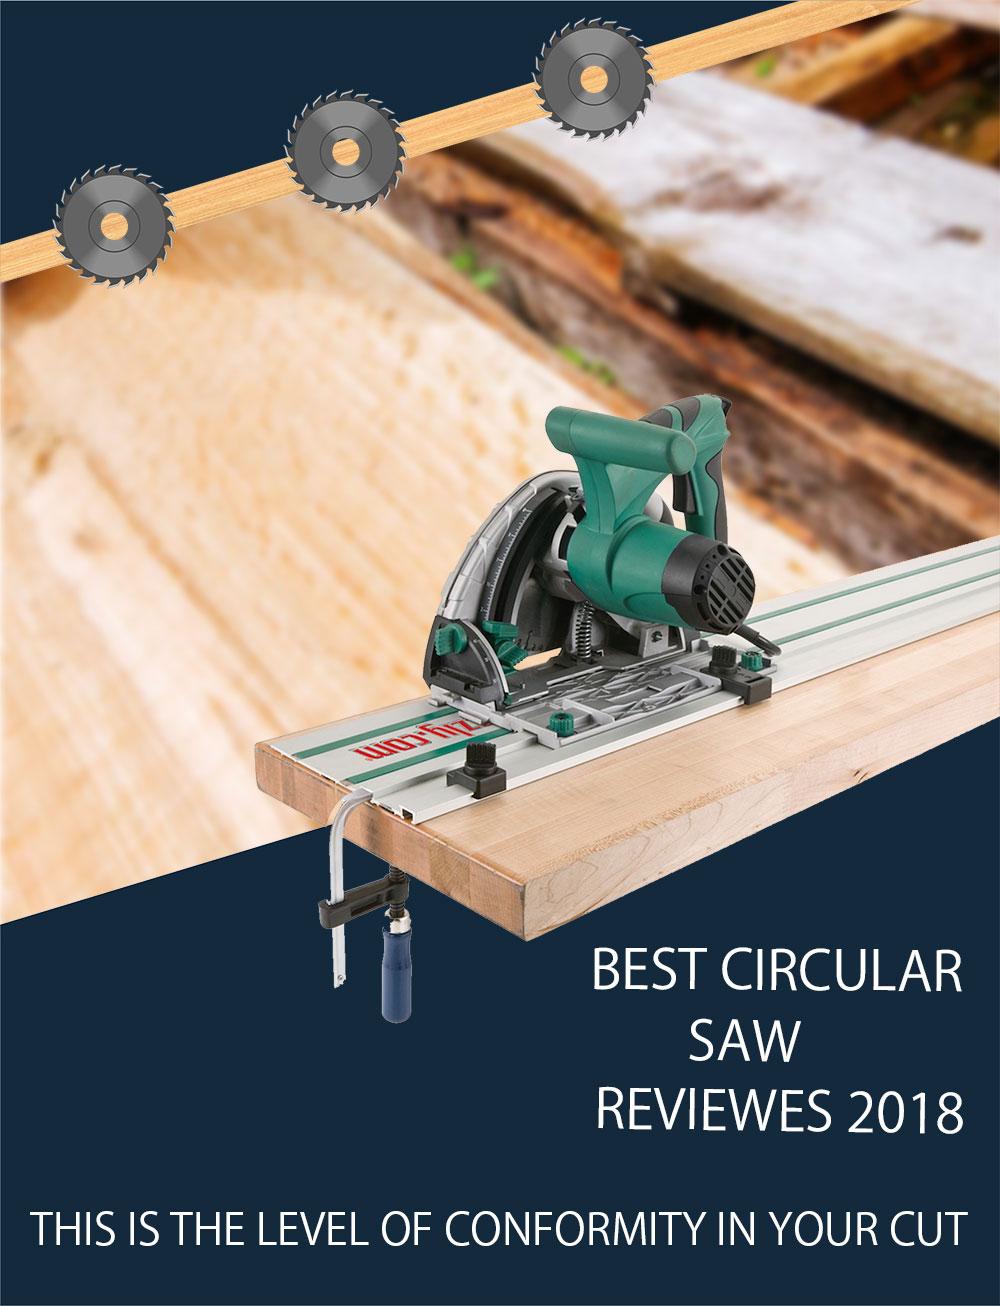 Best Circular Saw Reviews 2018 Opening Image